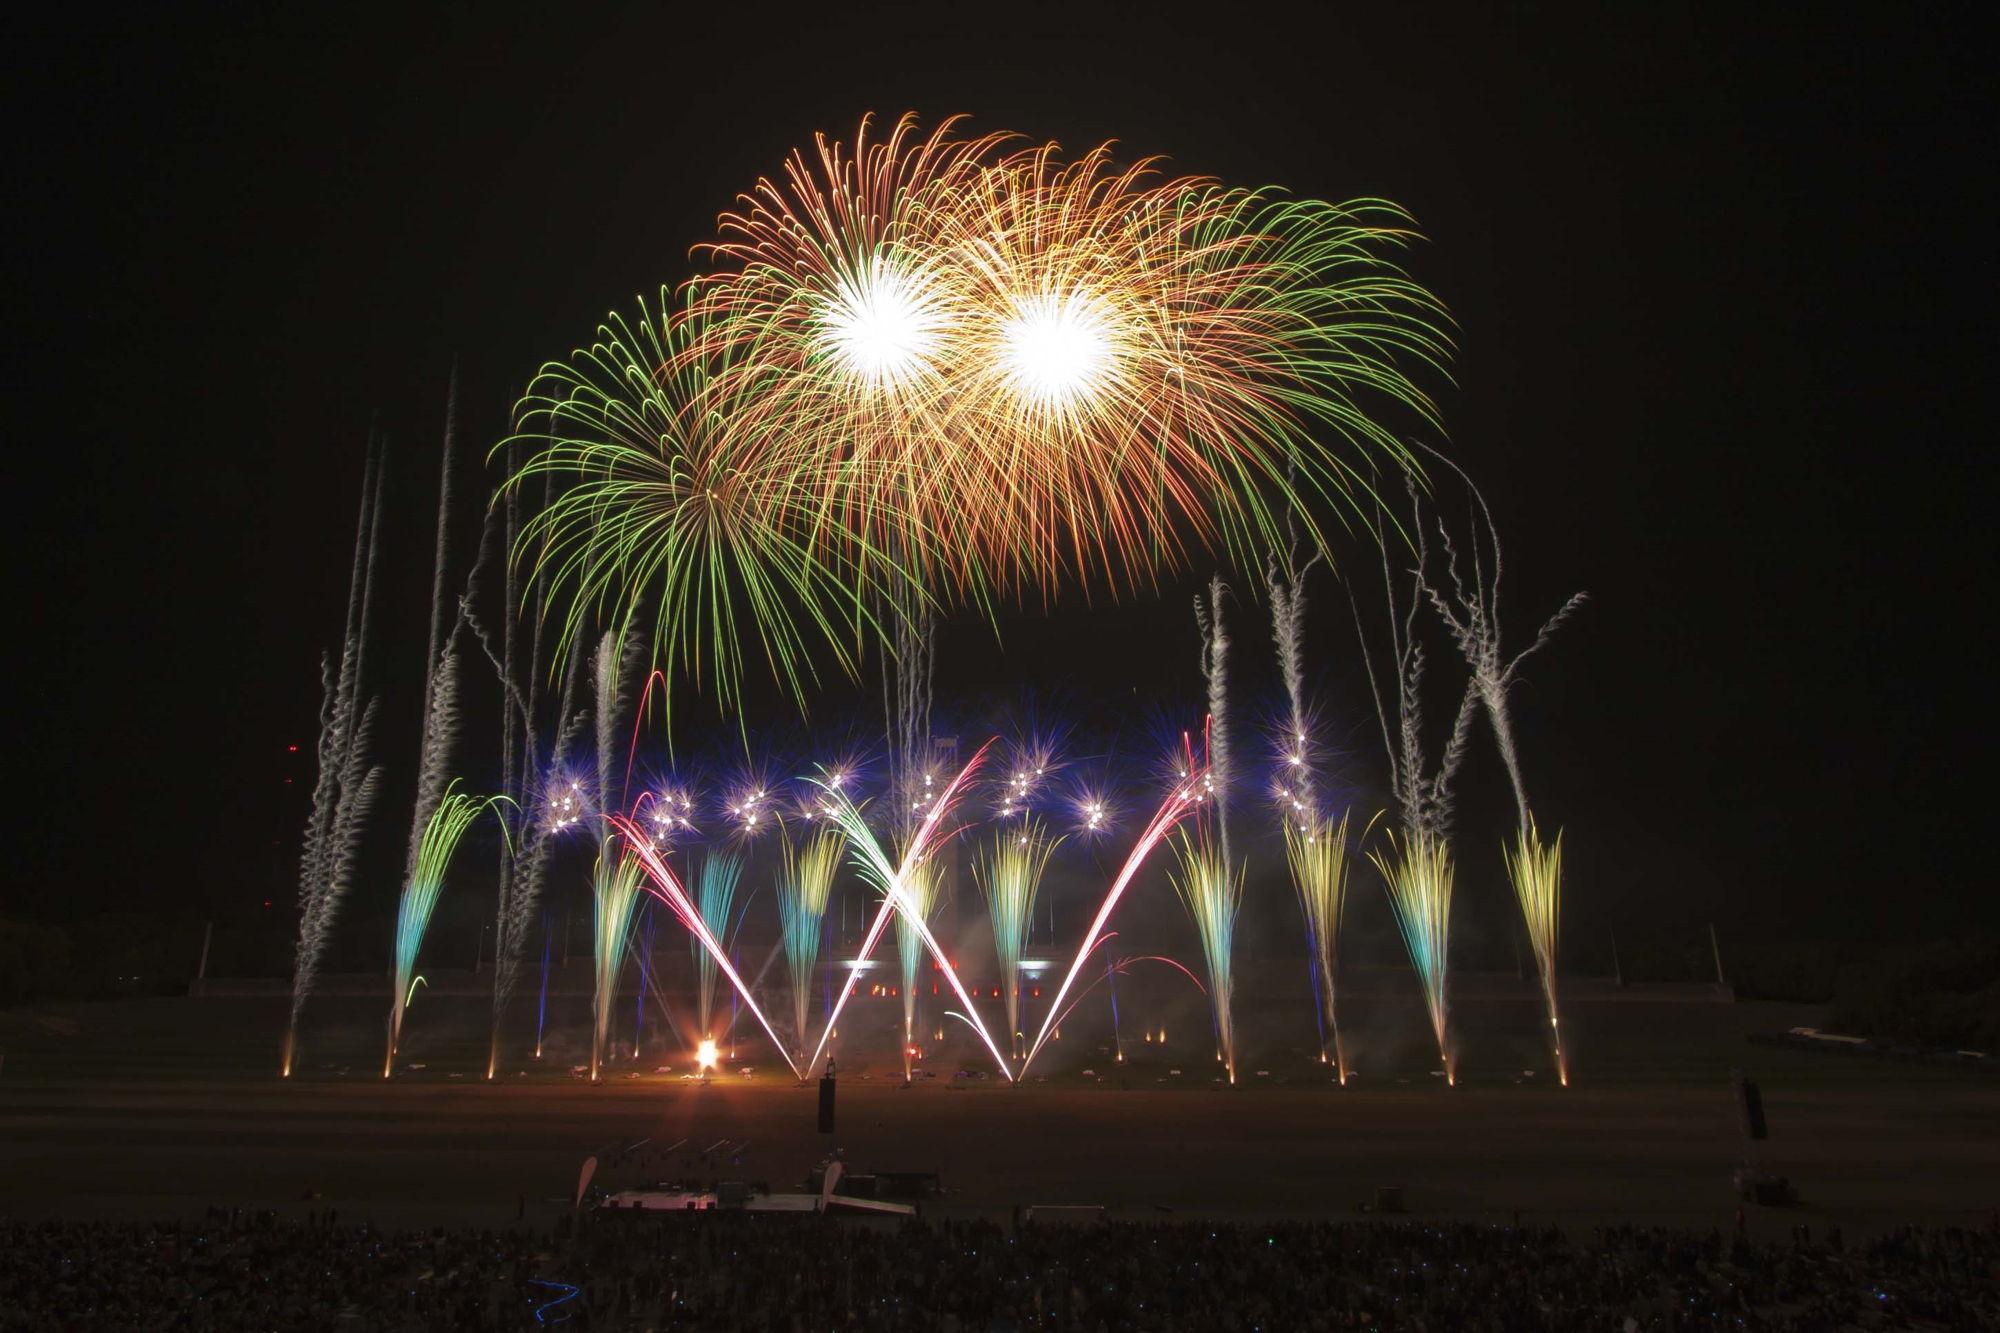 Music synchronized fireworks